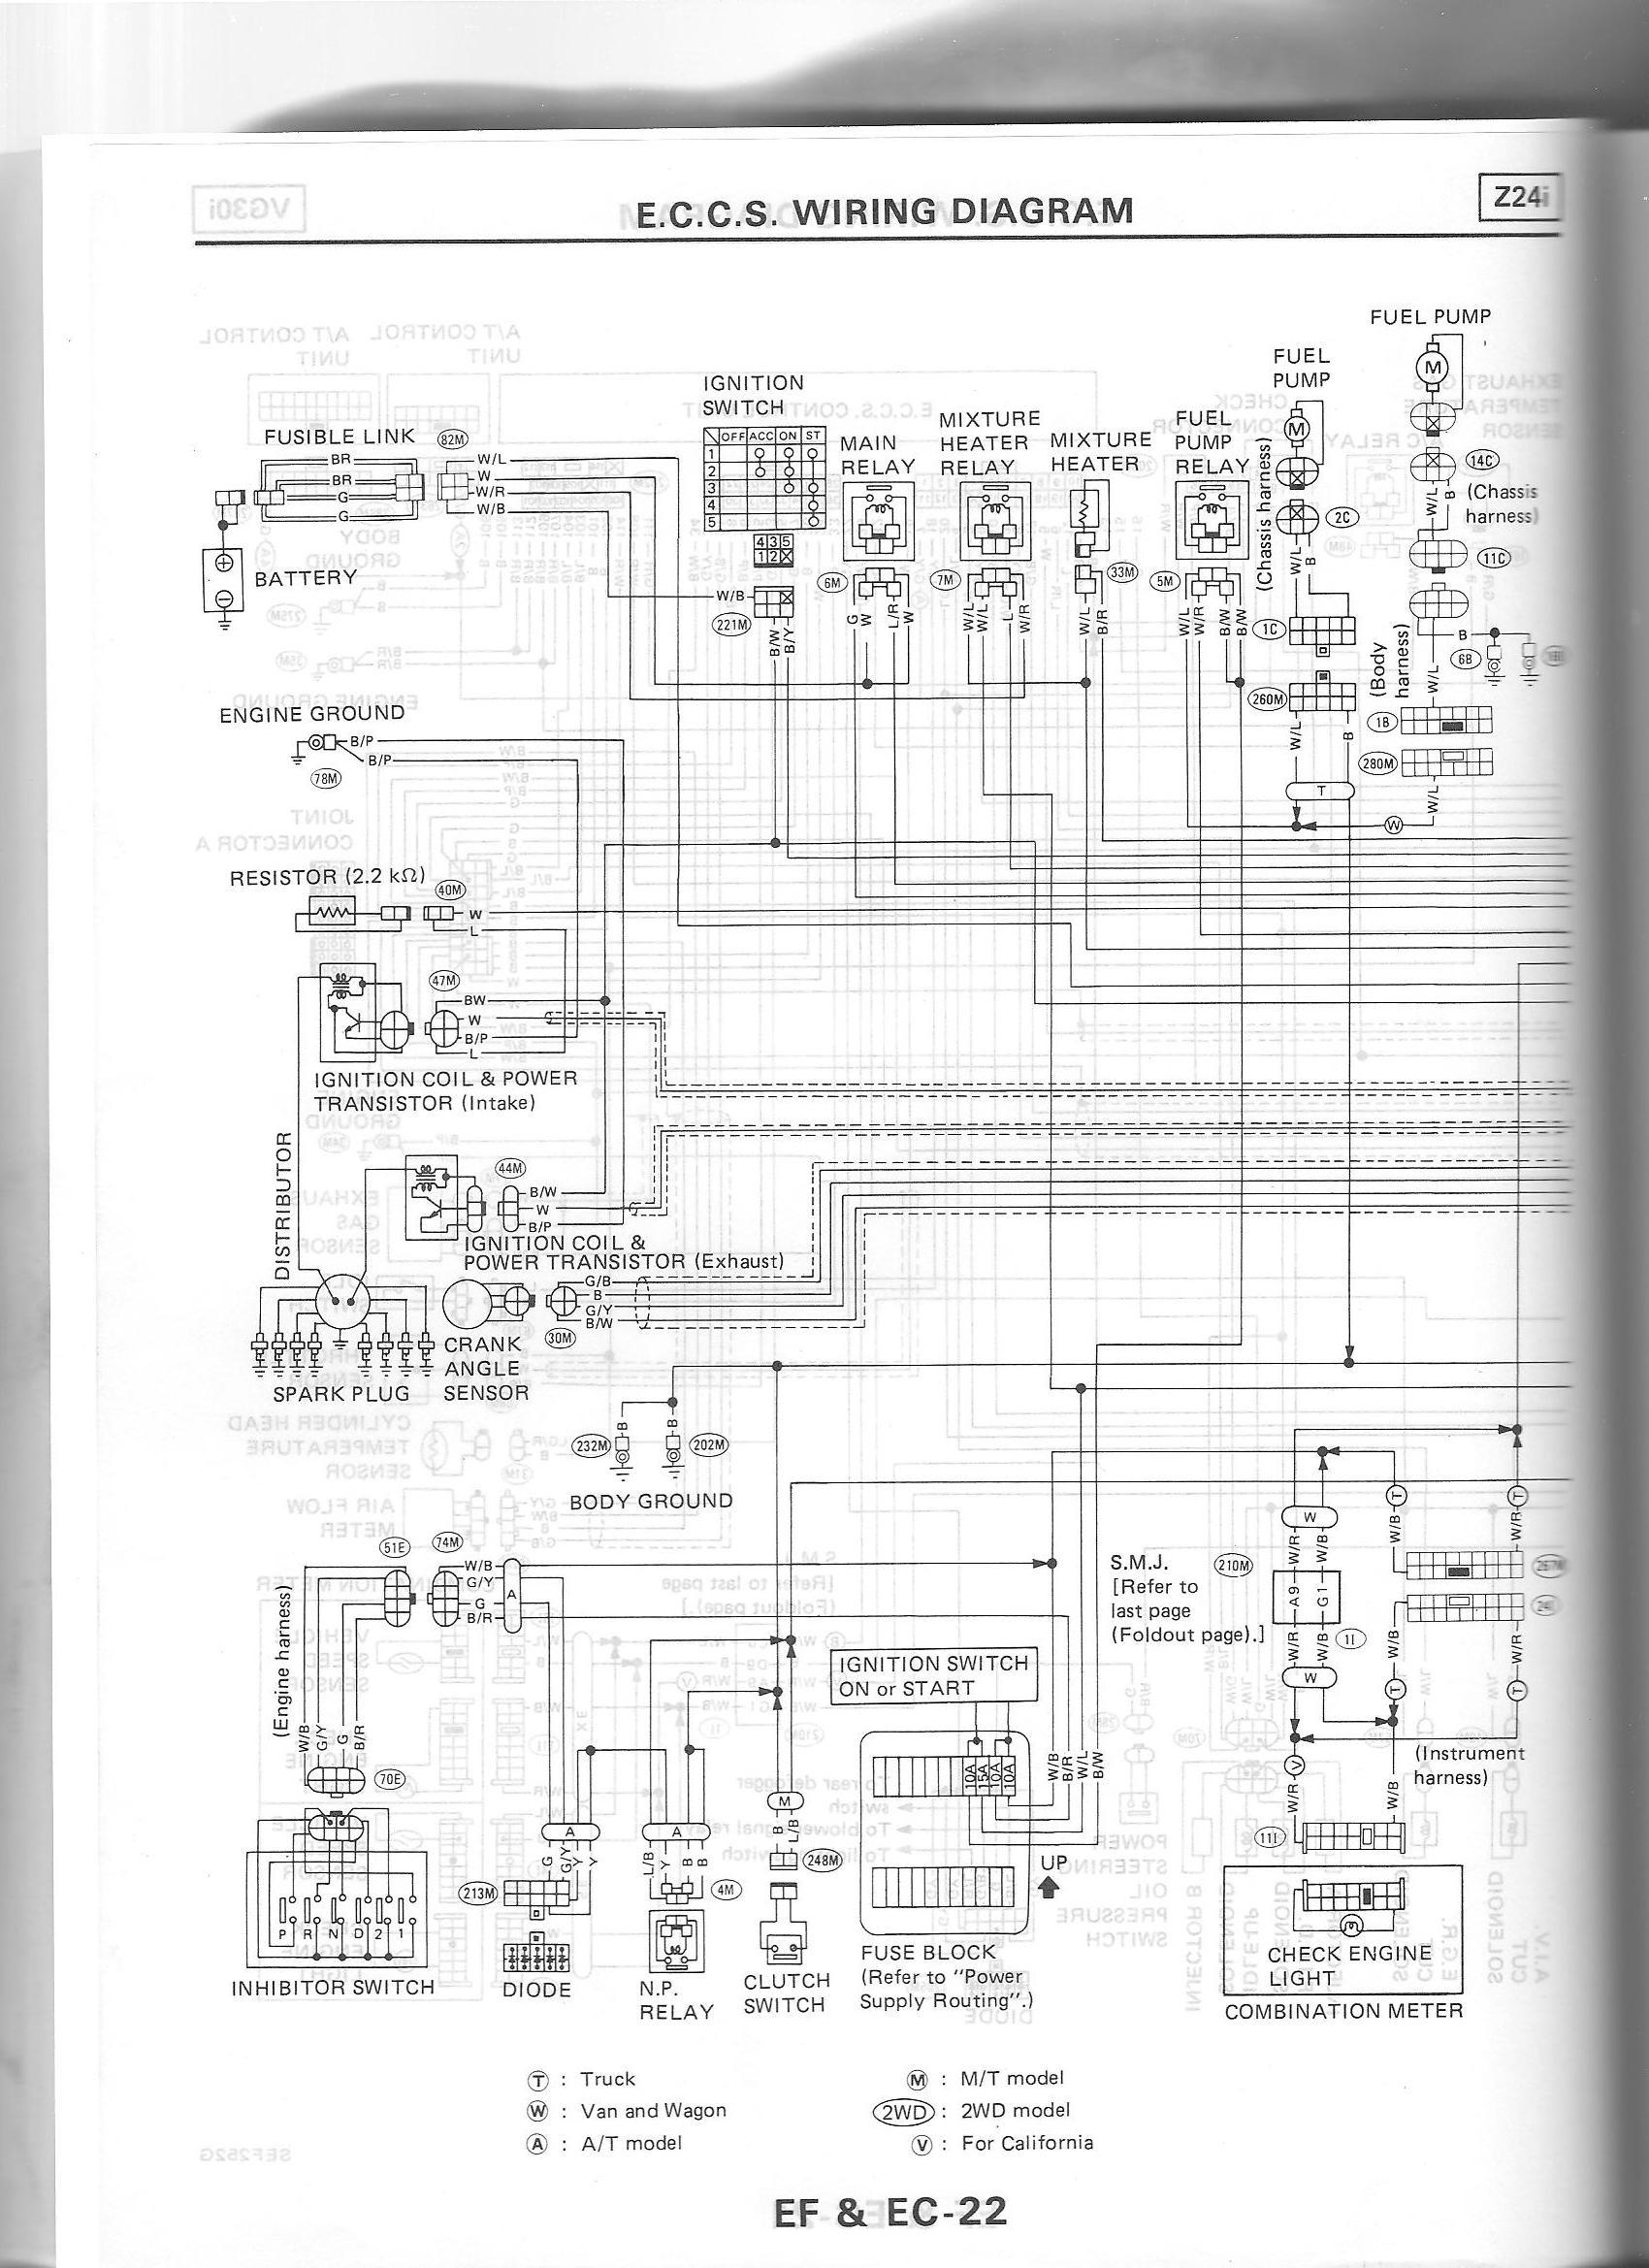 1997 Nissan Pickup Engine Diagram 87 Nissan D21 Wiring Another Blog About Wiring Diagram • Of 1997 Nissan Pickup Engine Diagram